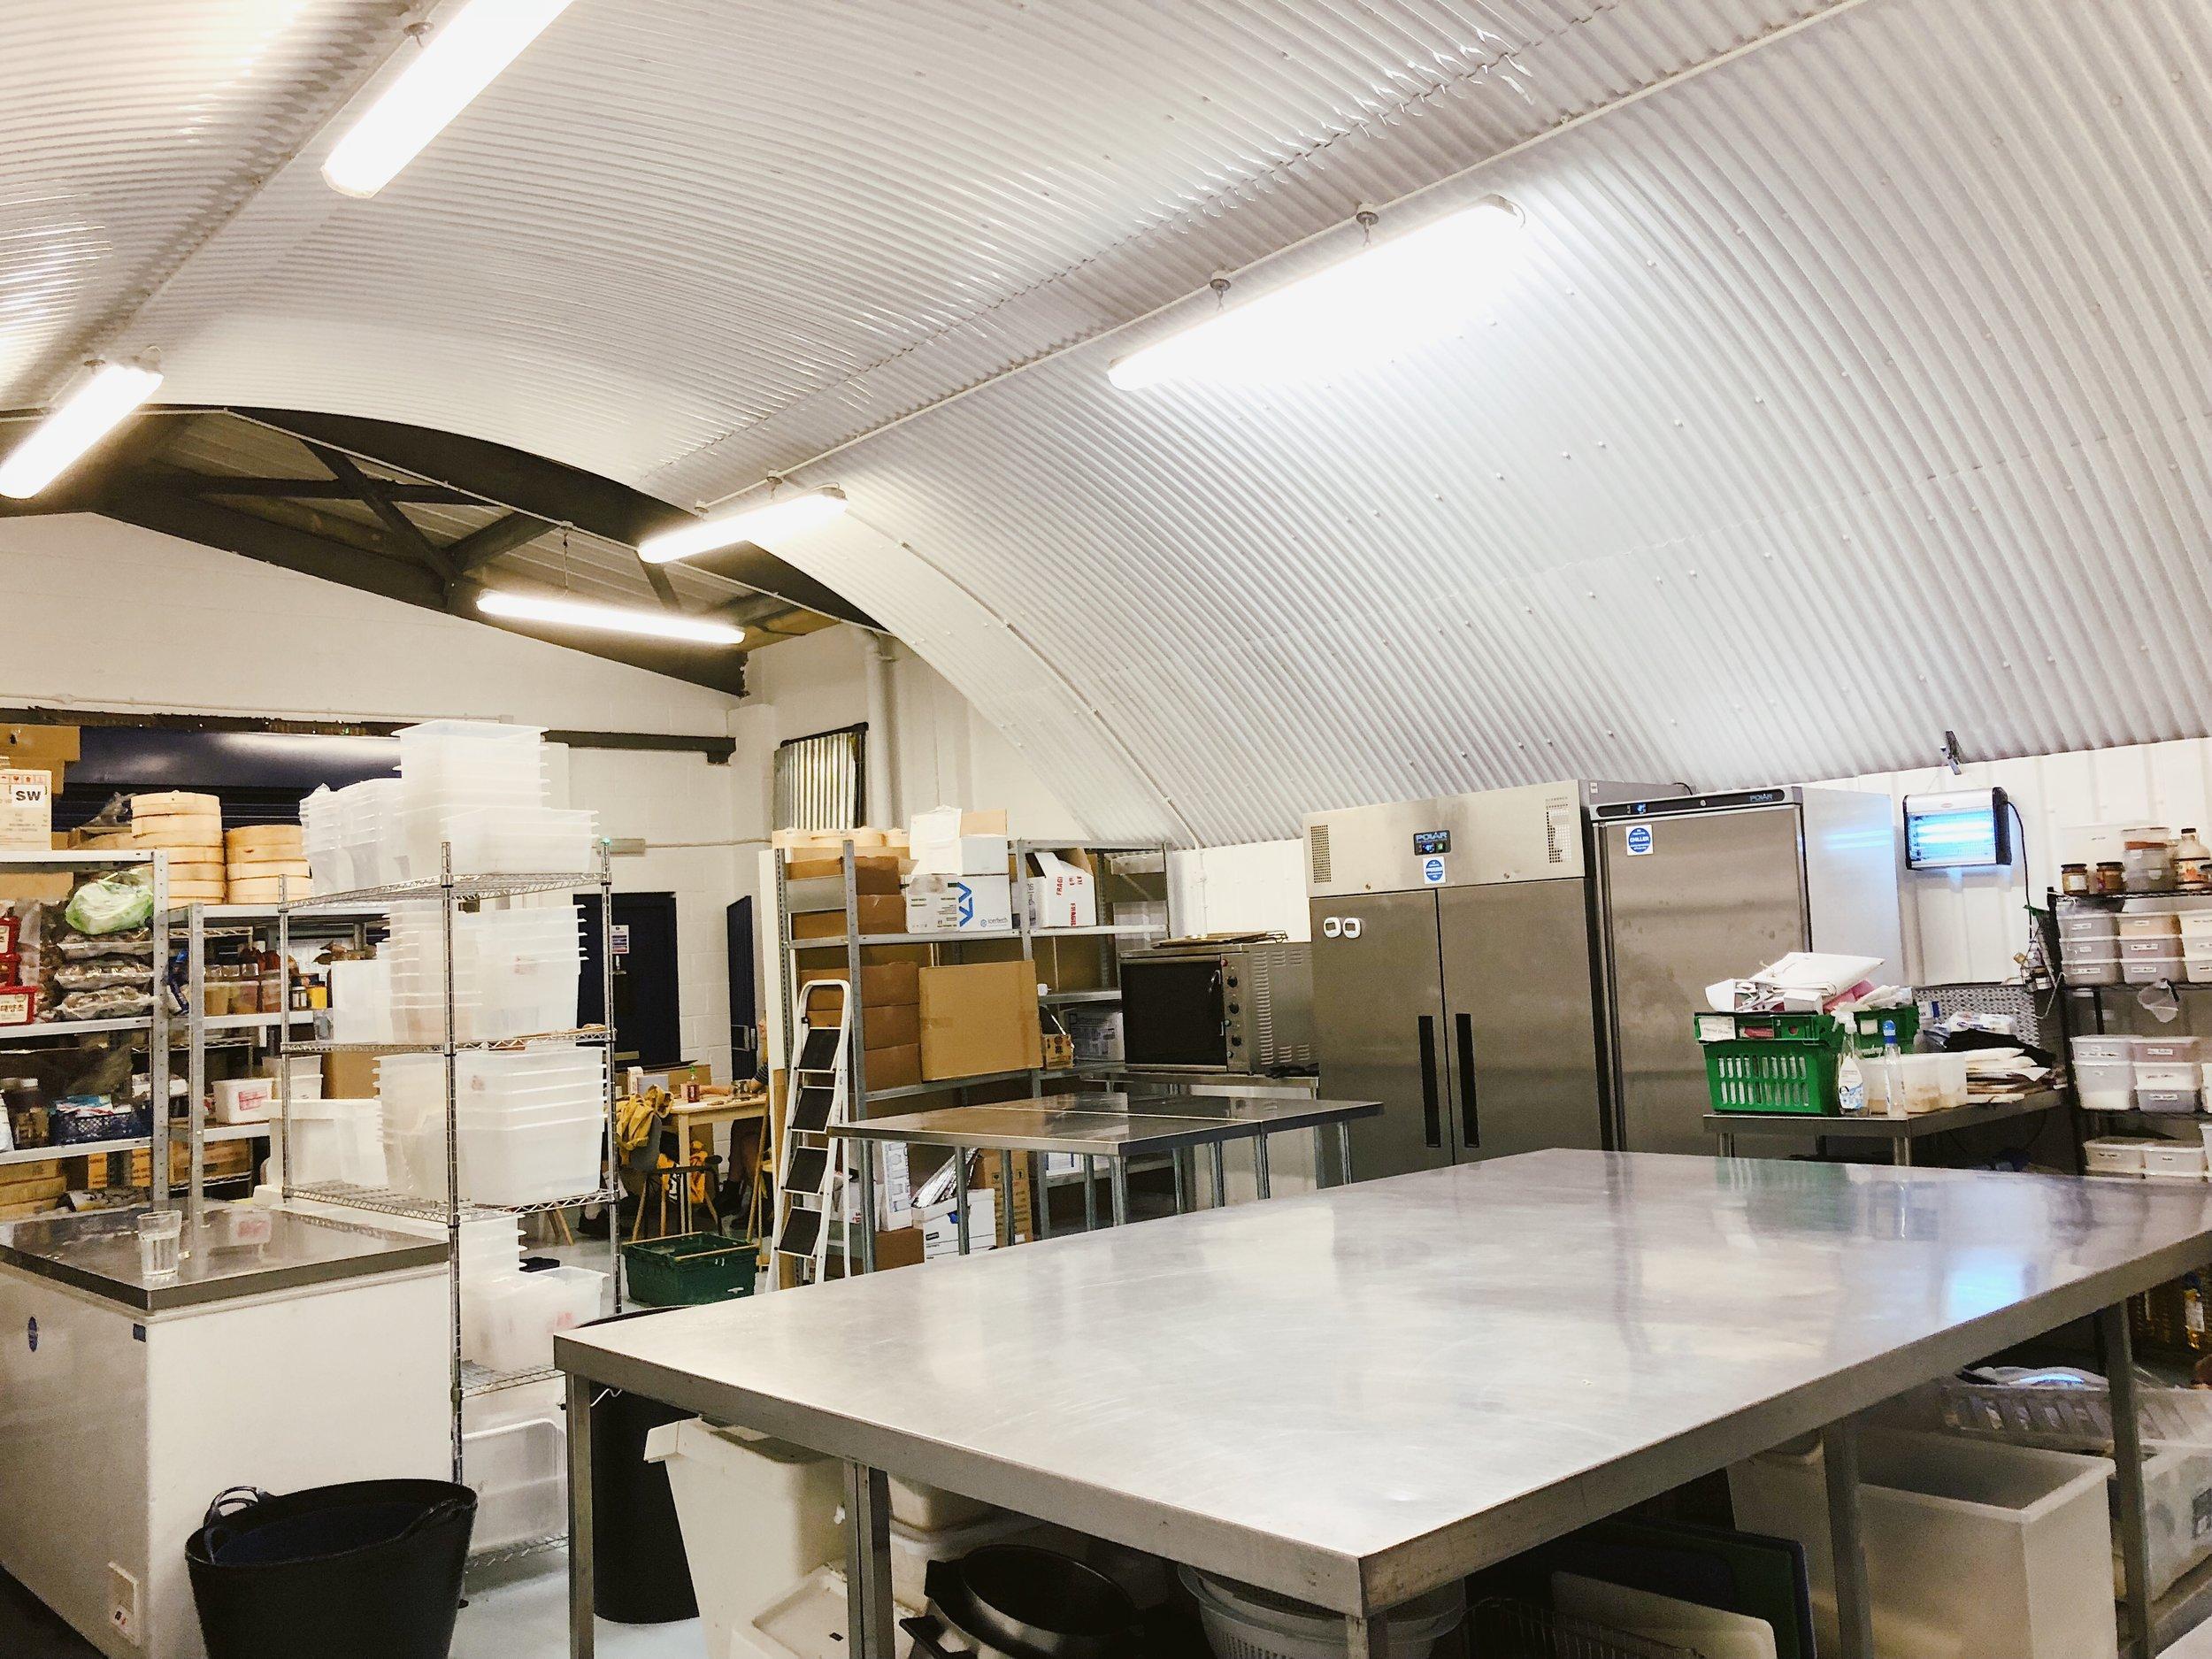 commercial.vegan.kitchen.hire.rent.shoreditch.spitafields.hackney.london.bow.east.2.jpg